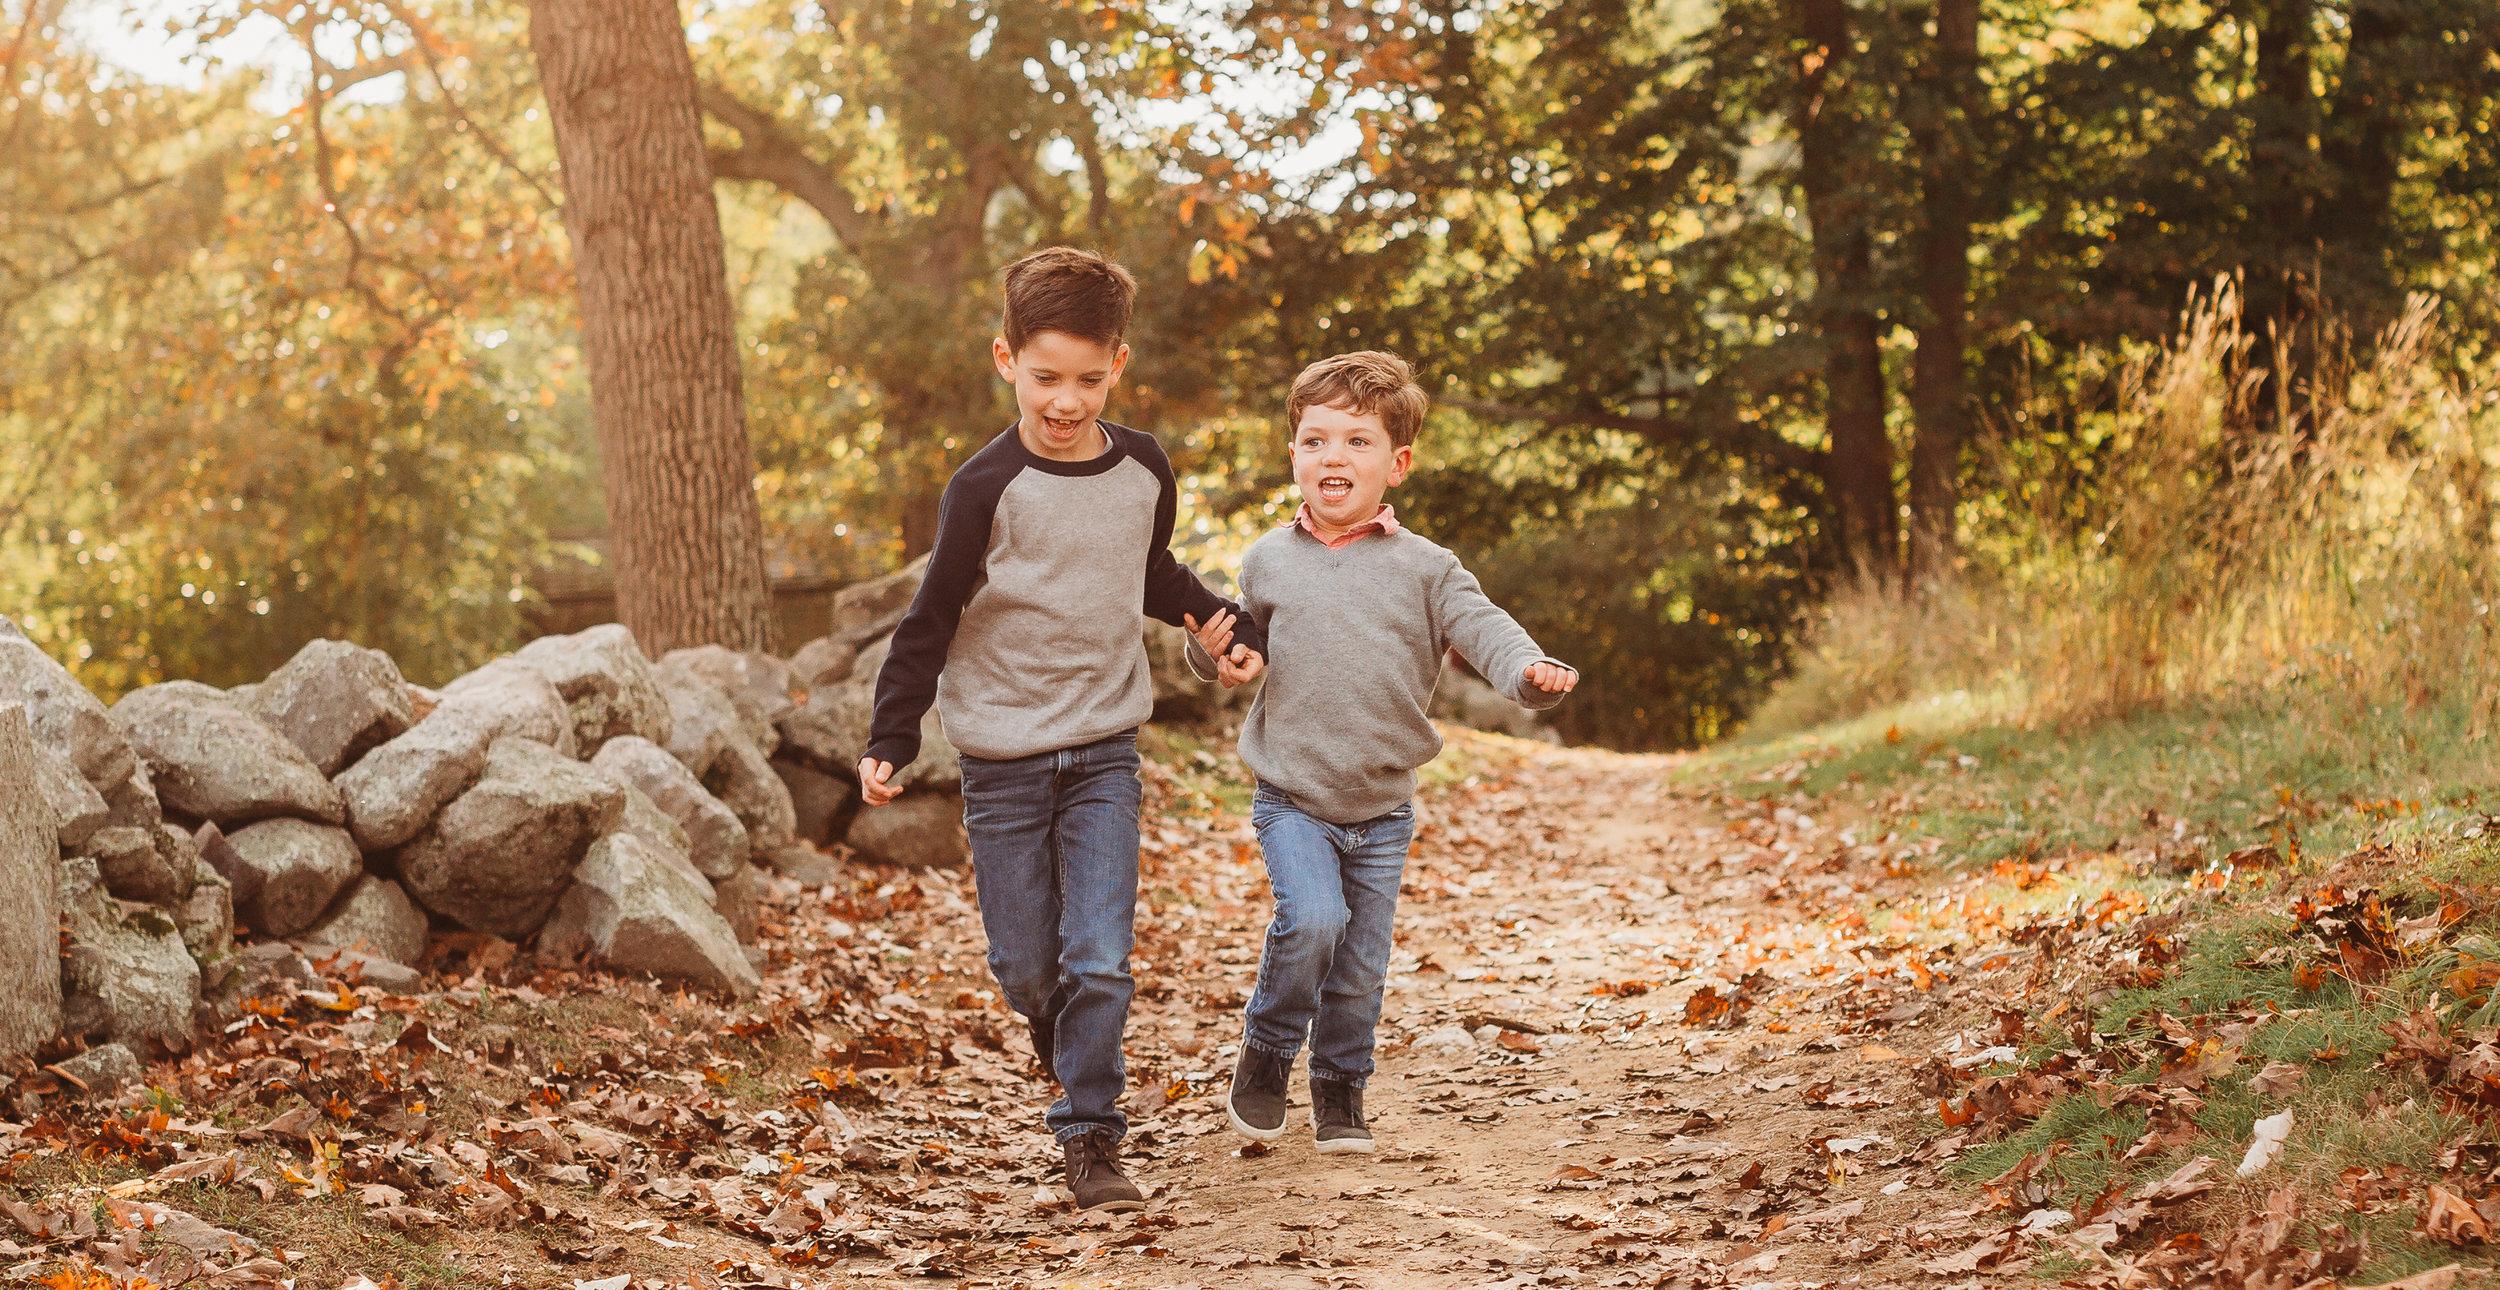 joyleducphotography-bostonfamilyphotographer-lifestyleportraiture-11.jpg